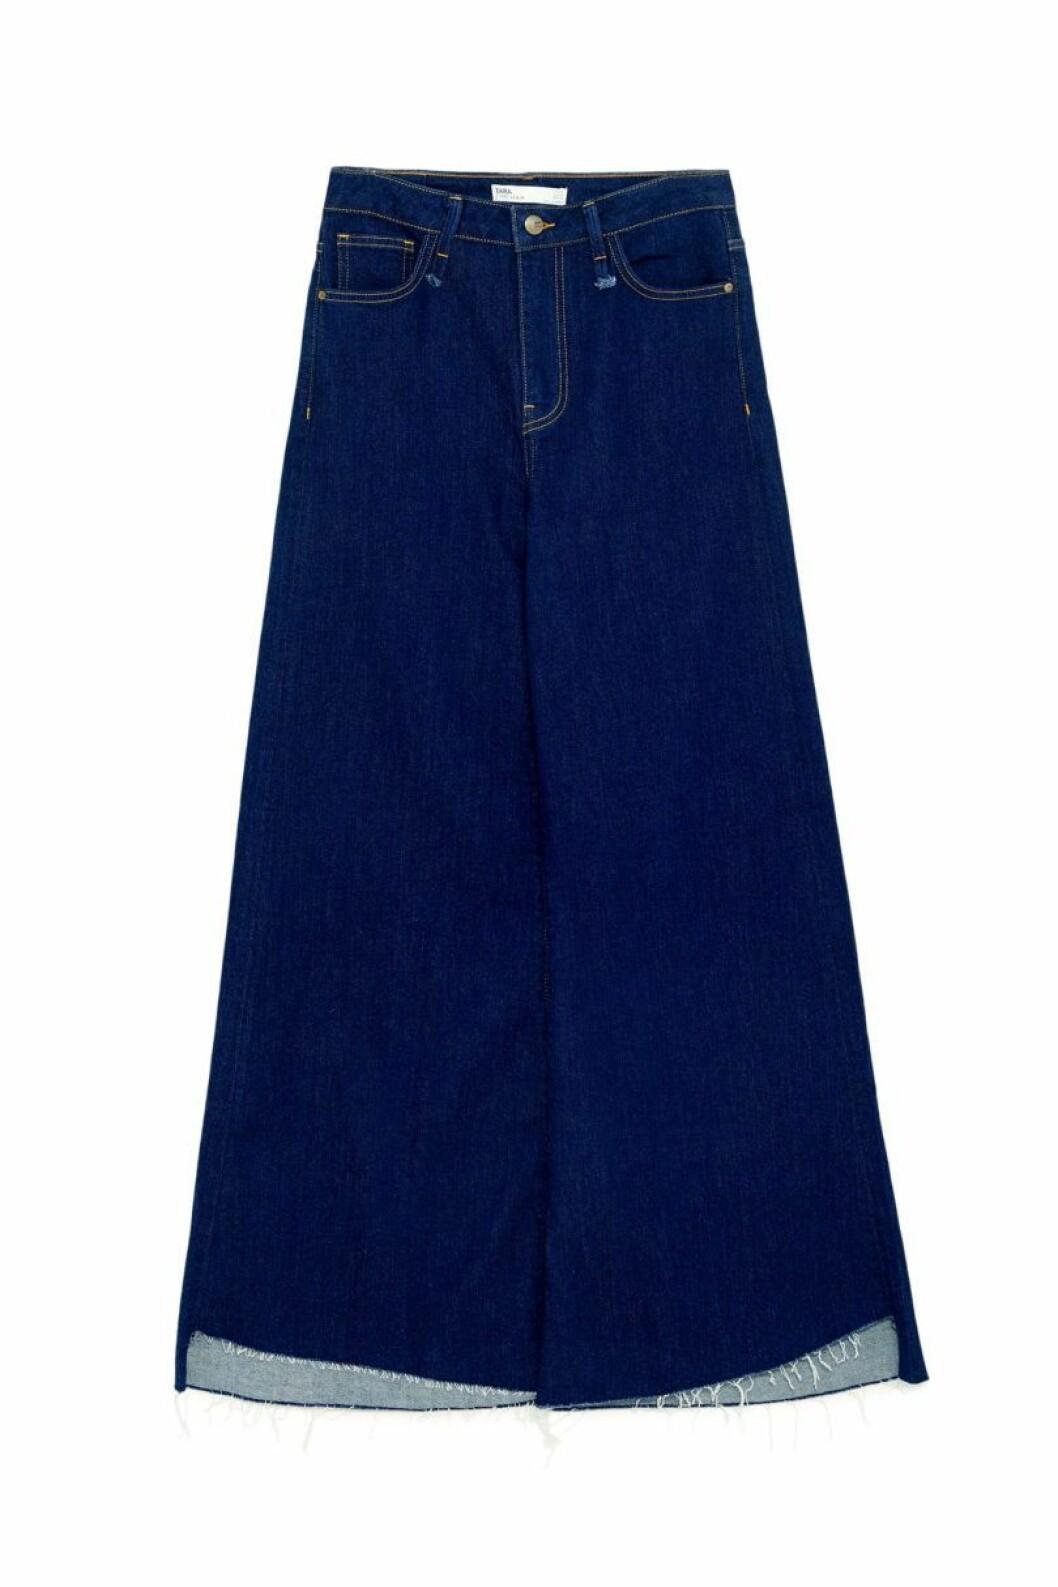 vida-mörk-blå-denim-jeans-zara